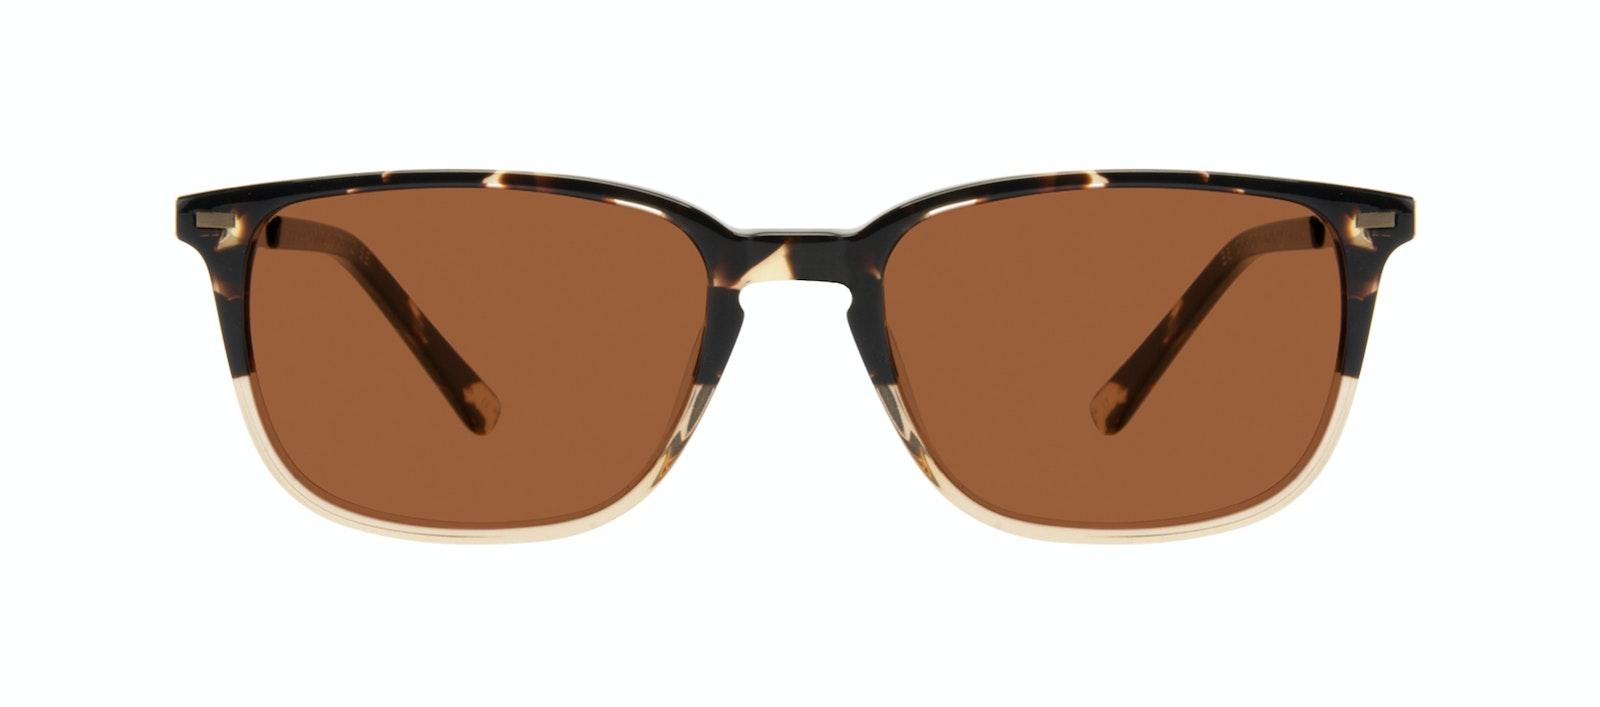 Affordable Fashion Glasses Rectangle Sunglasses Men Sharp Golden Tortoise Front